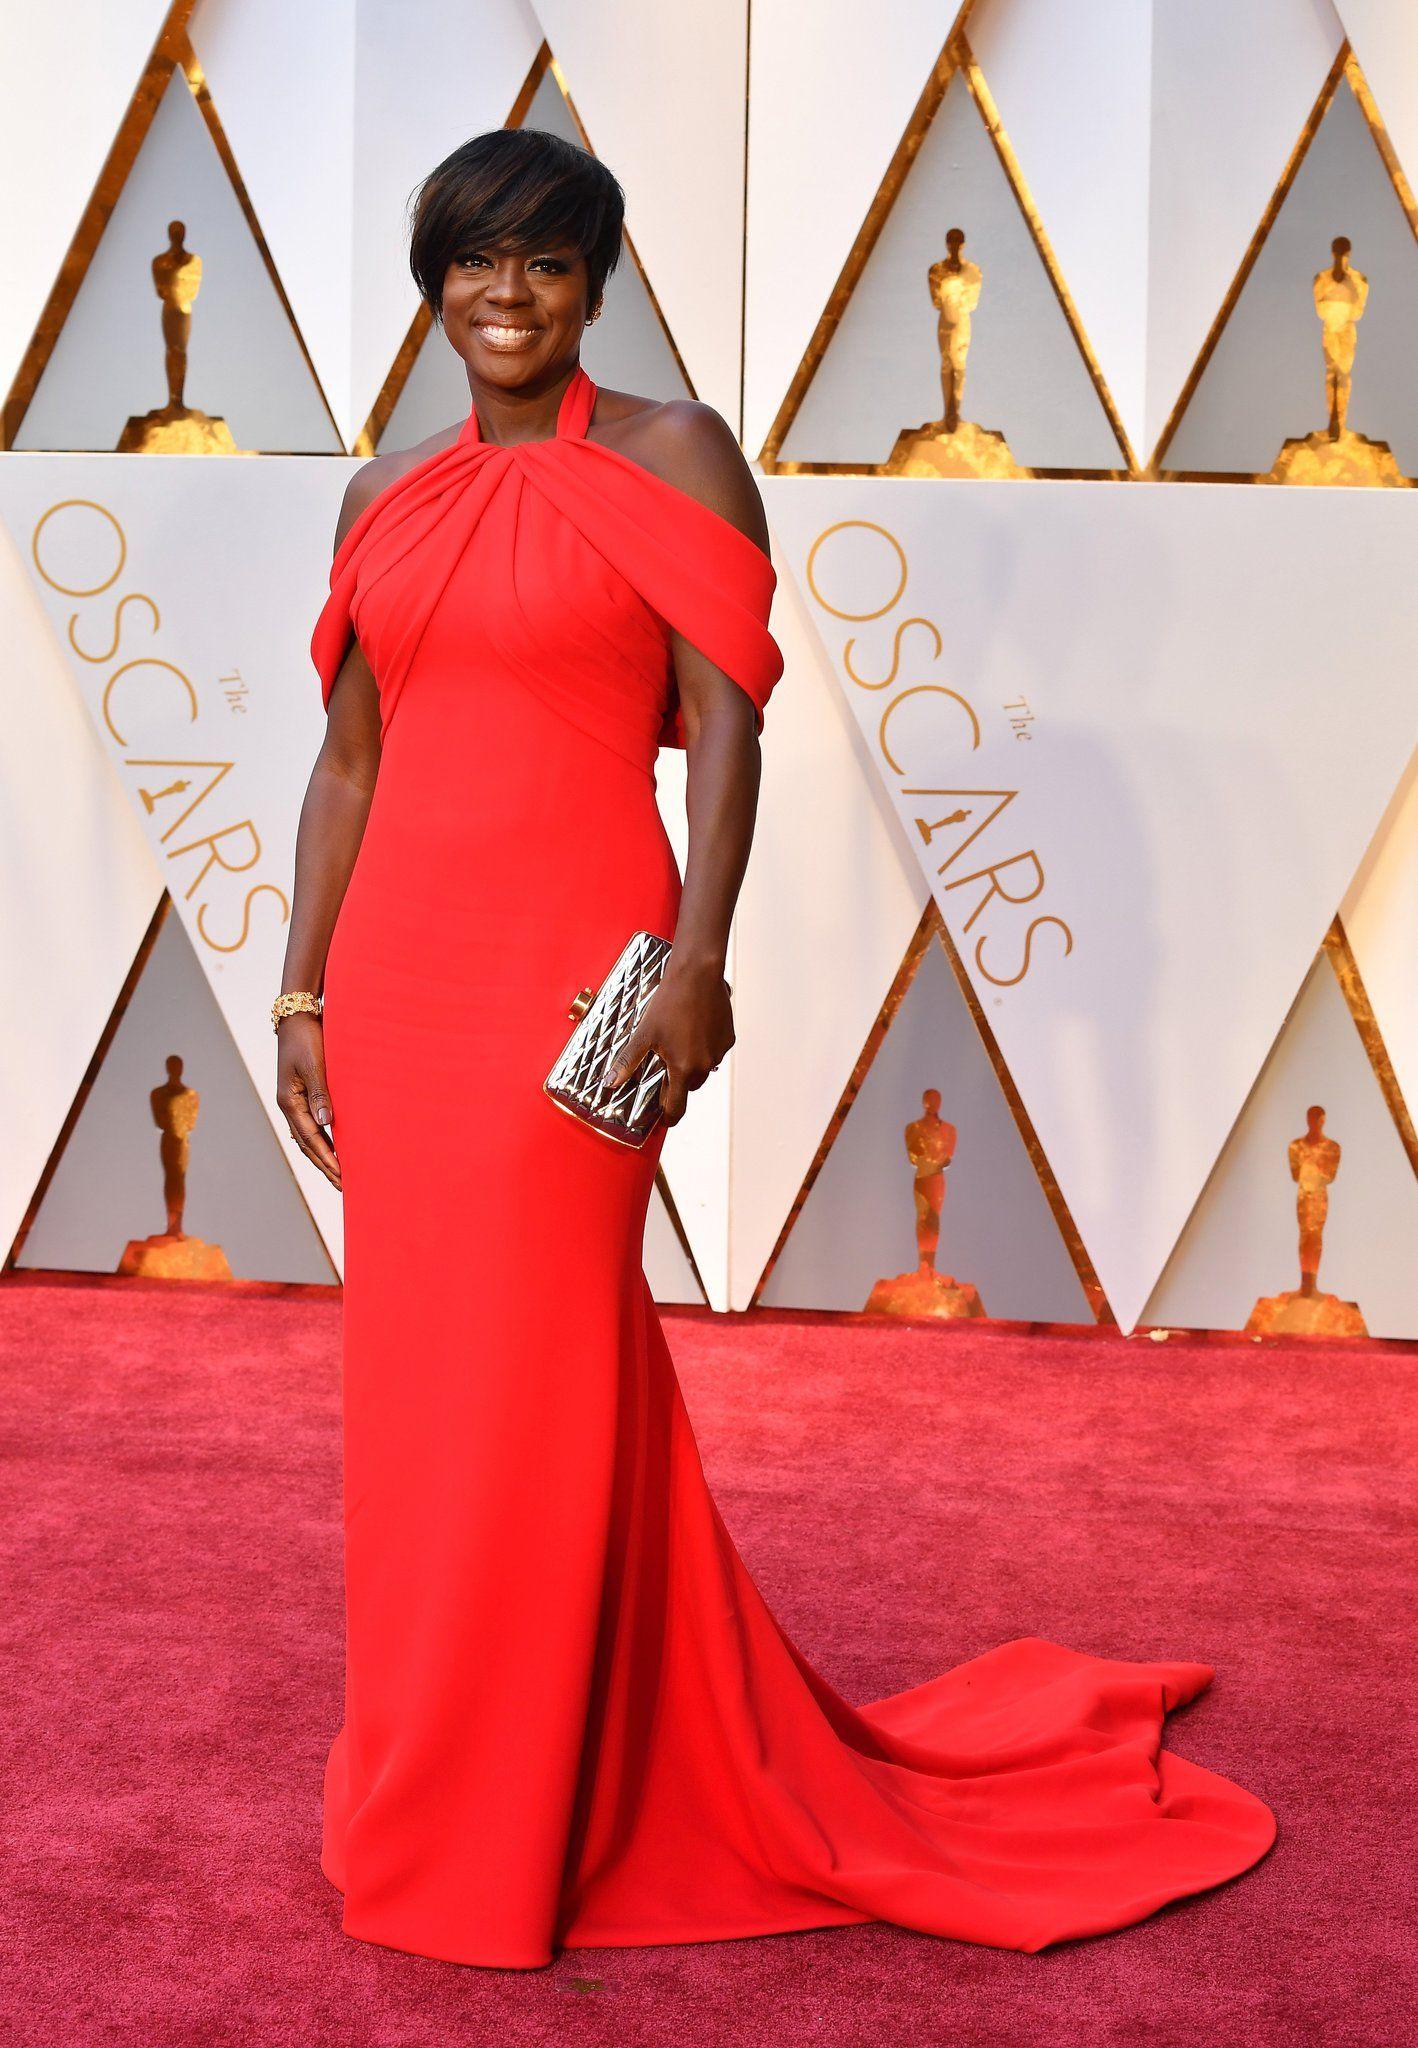 Viola Davis Oscar 2017 Red Carpet Arrival Oscars Red Carpet Arrivals 2017 Oscars 2017 Photos 89th Academy Awards Nice Dresses Oscars 2017 Red Carpet Celebrity Dresses